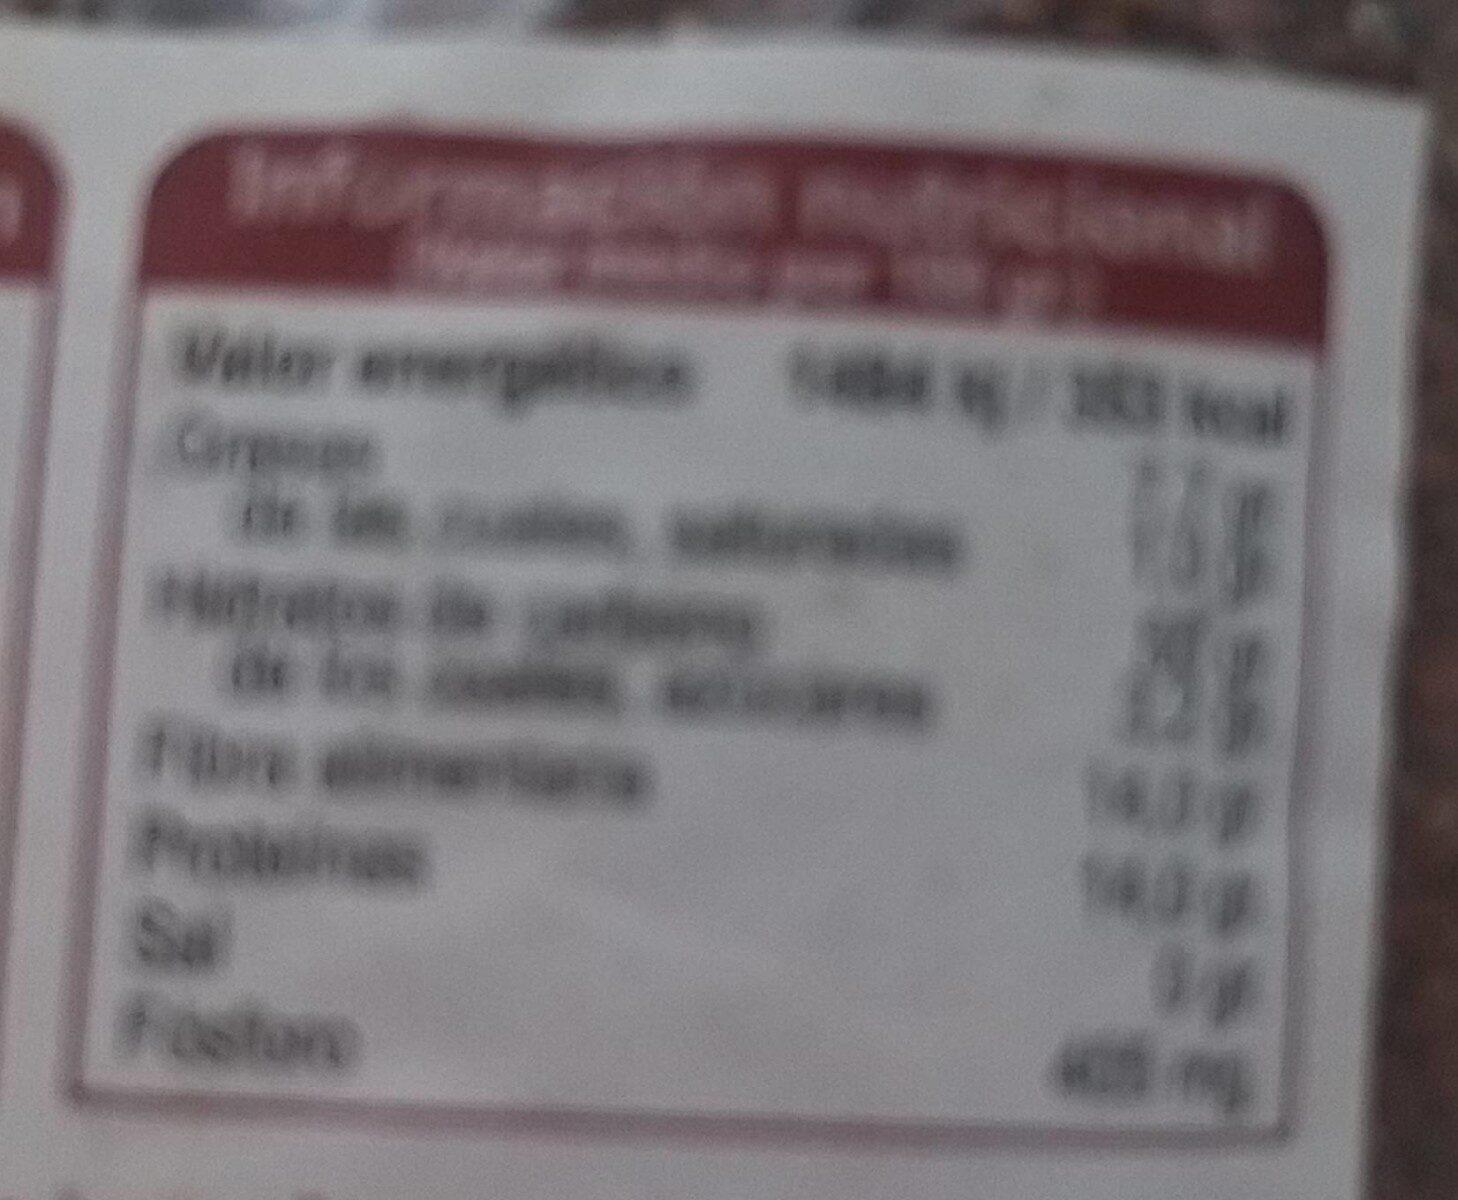 Quinoa premium - Informations nutritionnelles - es